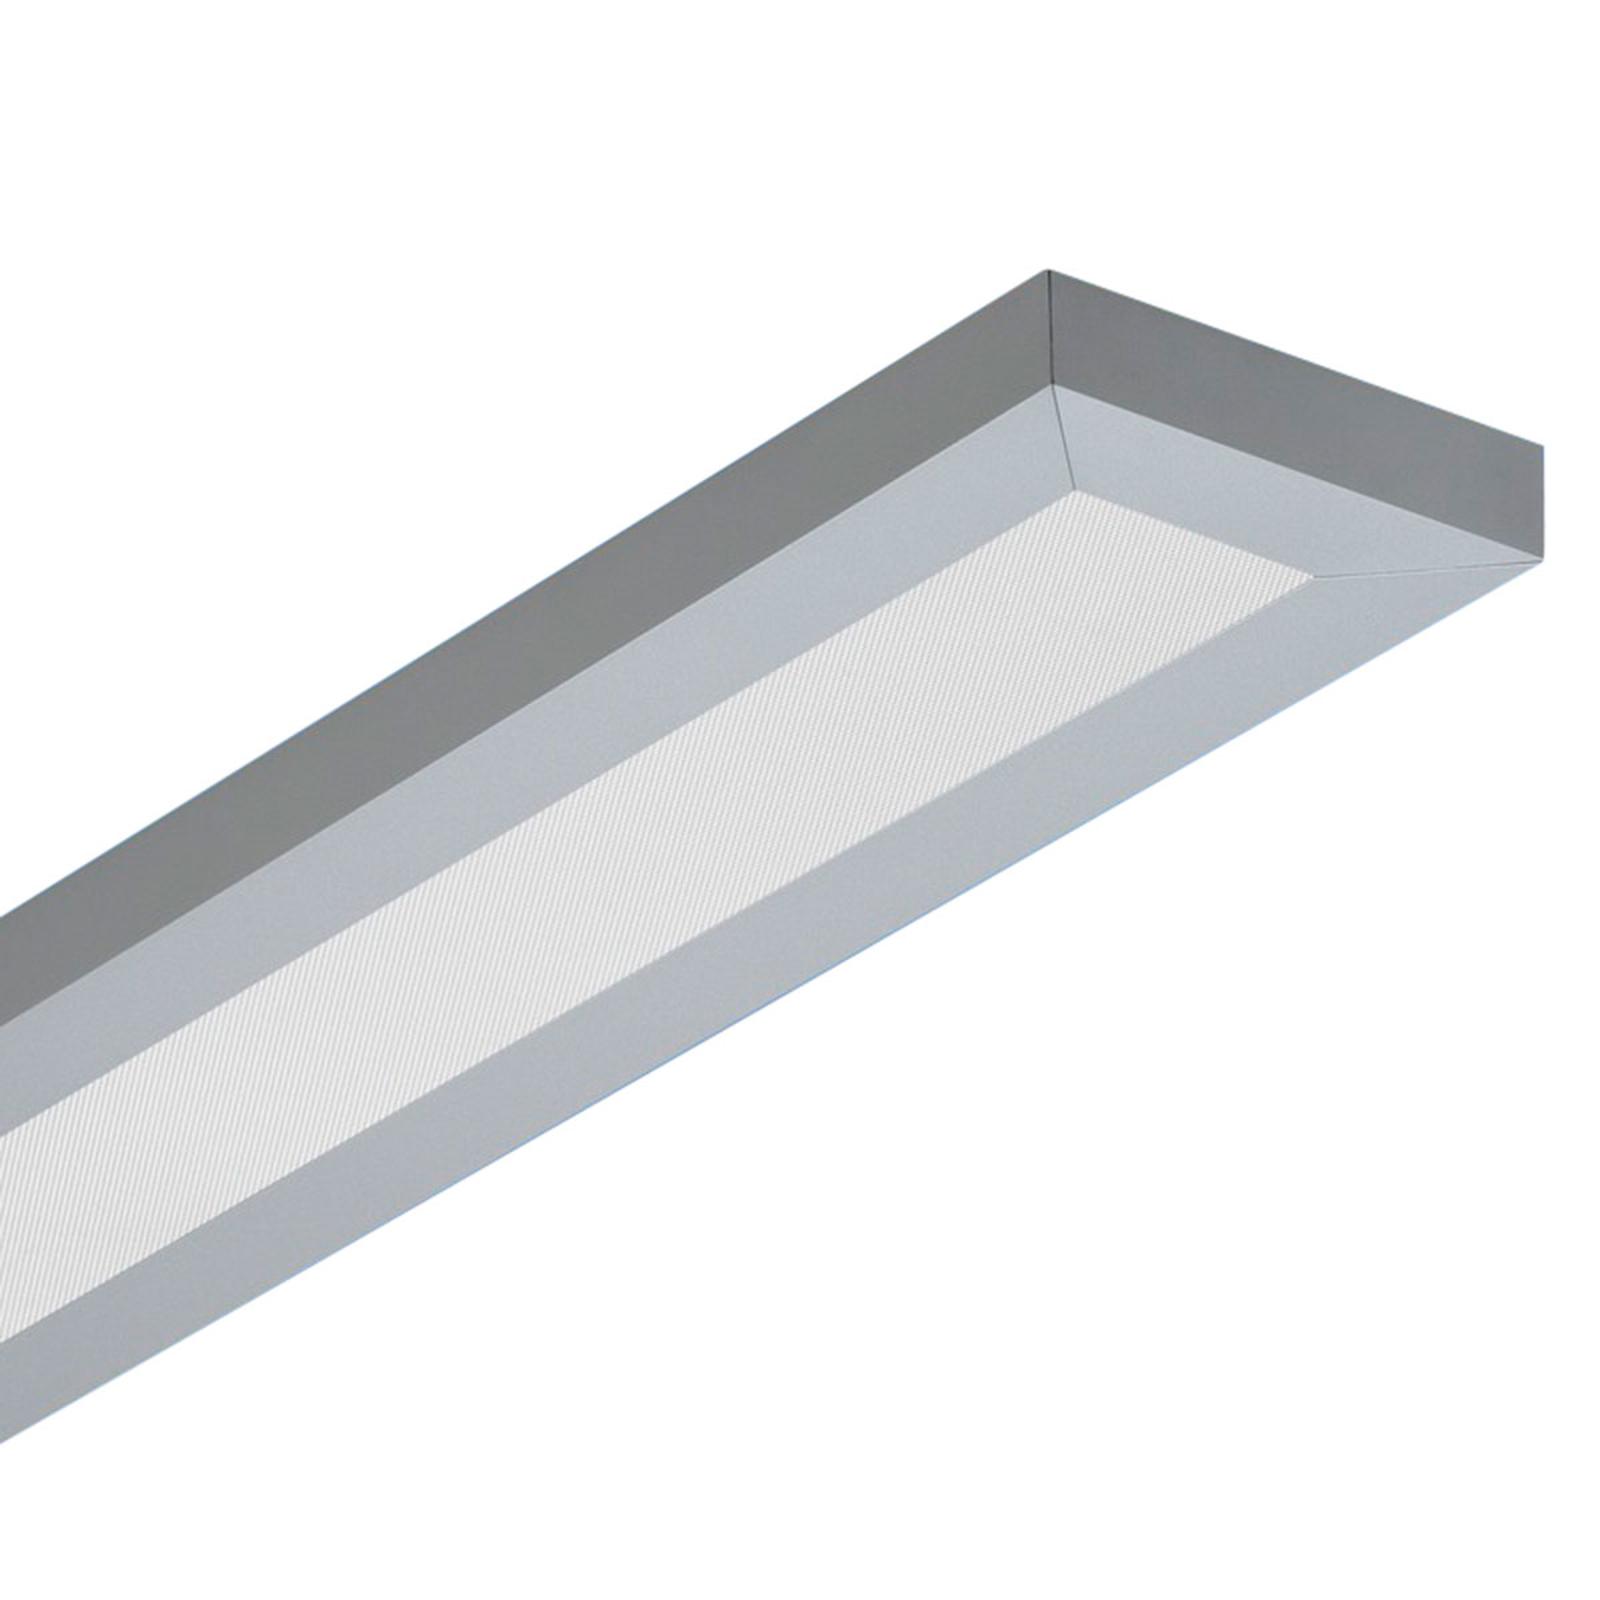 Langwerpige LED hanglamp LAP, 30,4 W, 3.000 K